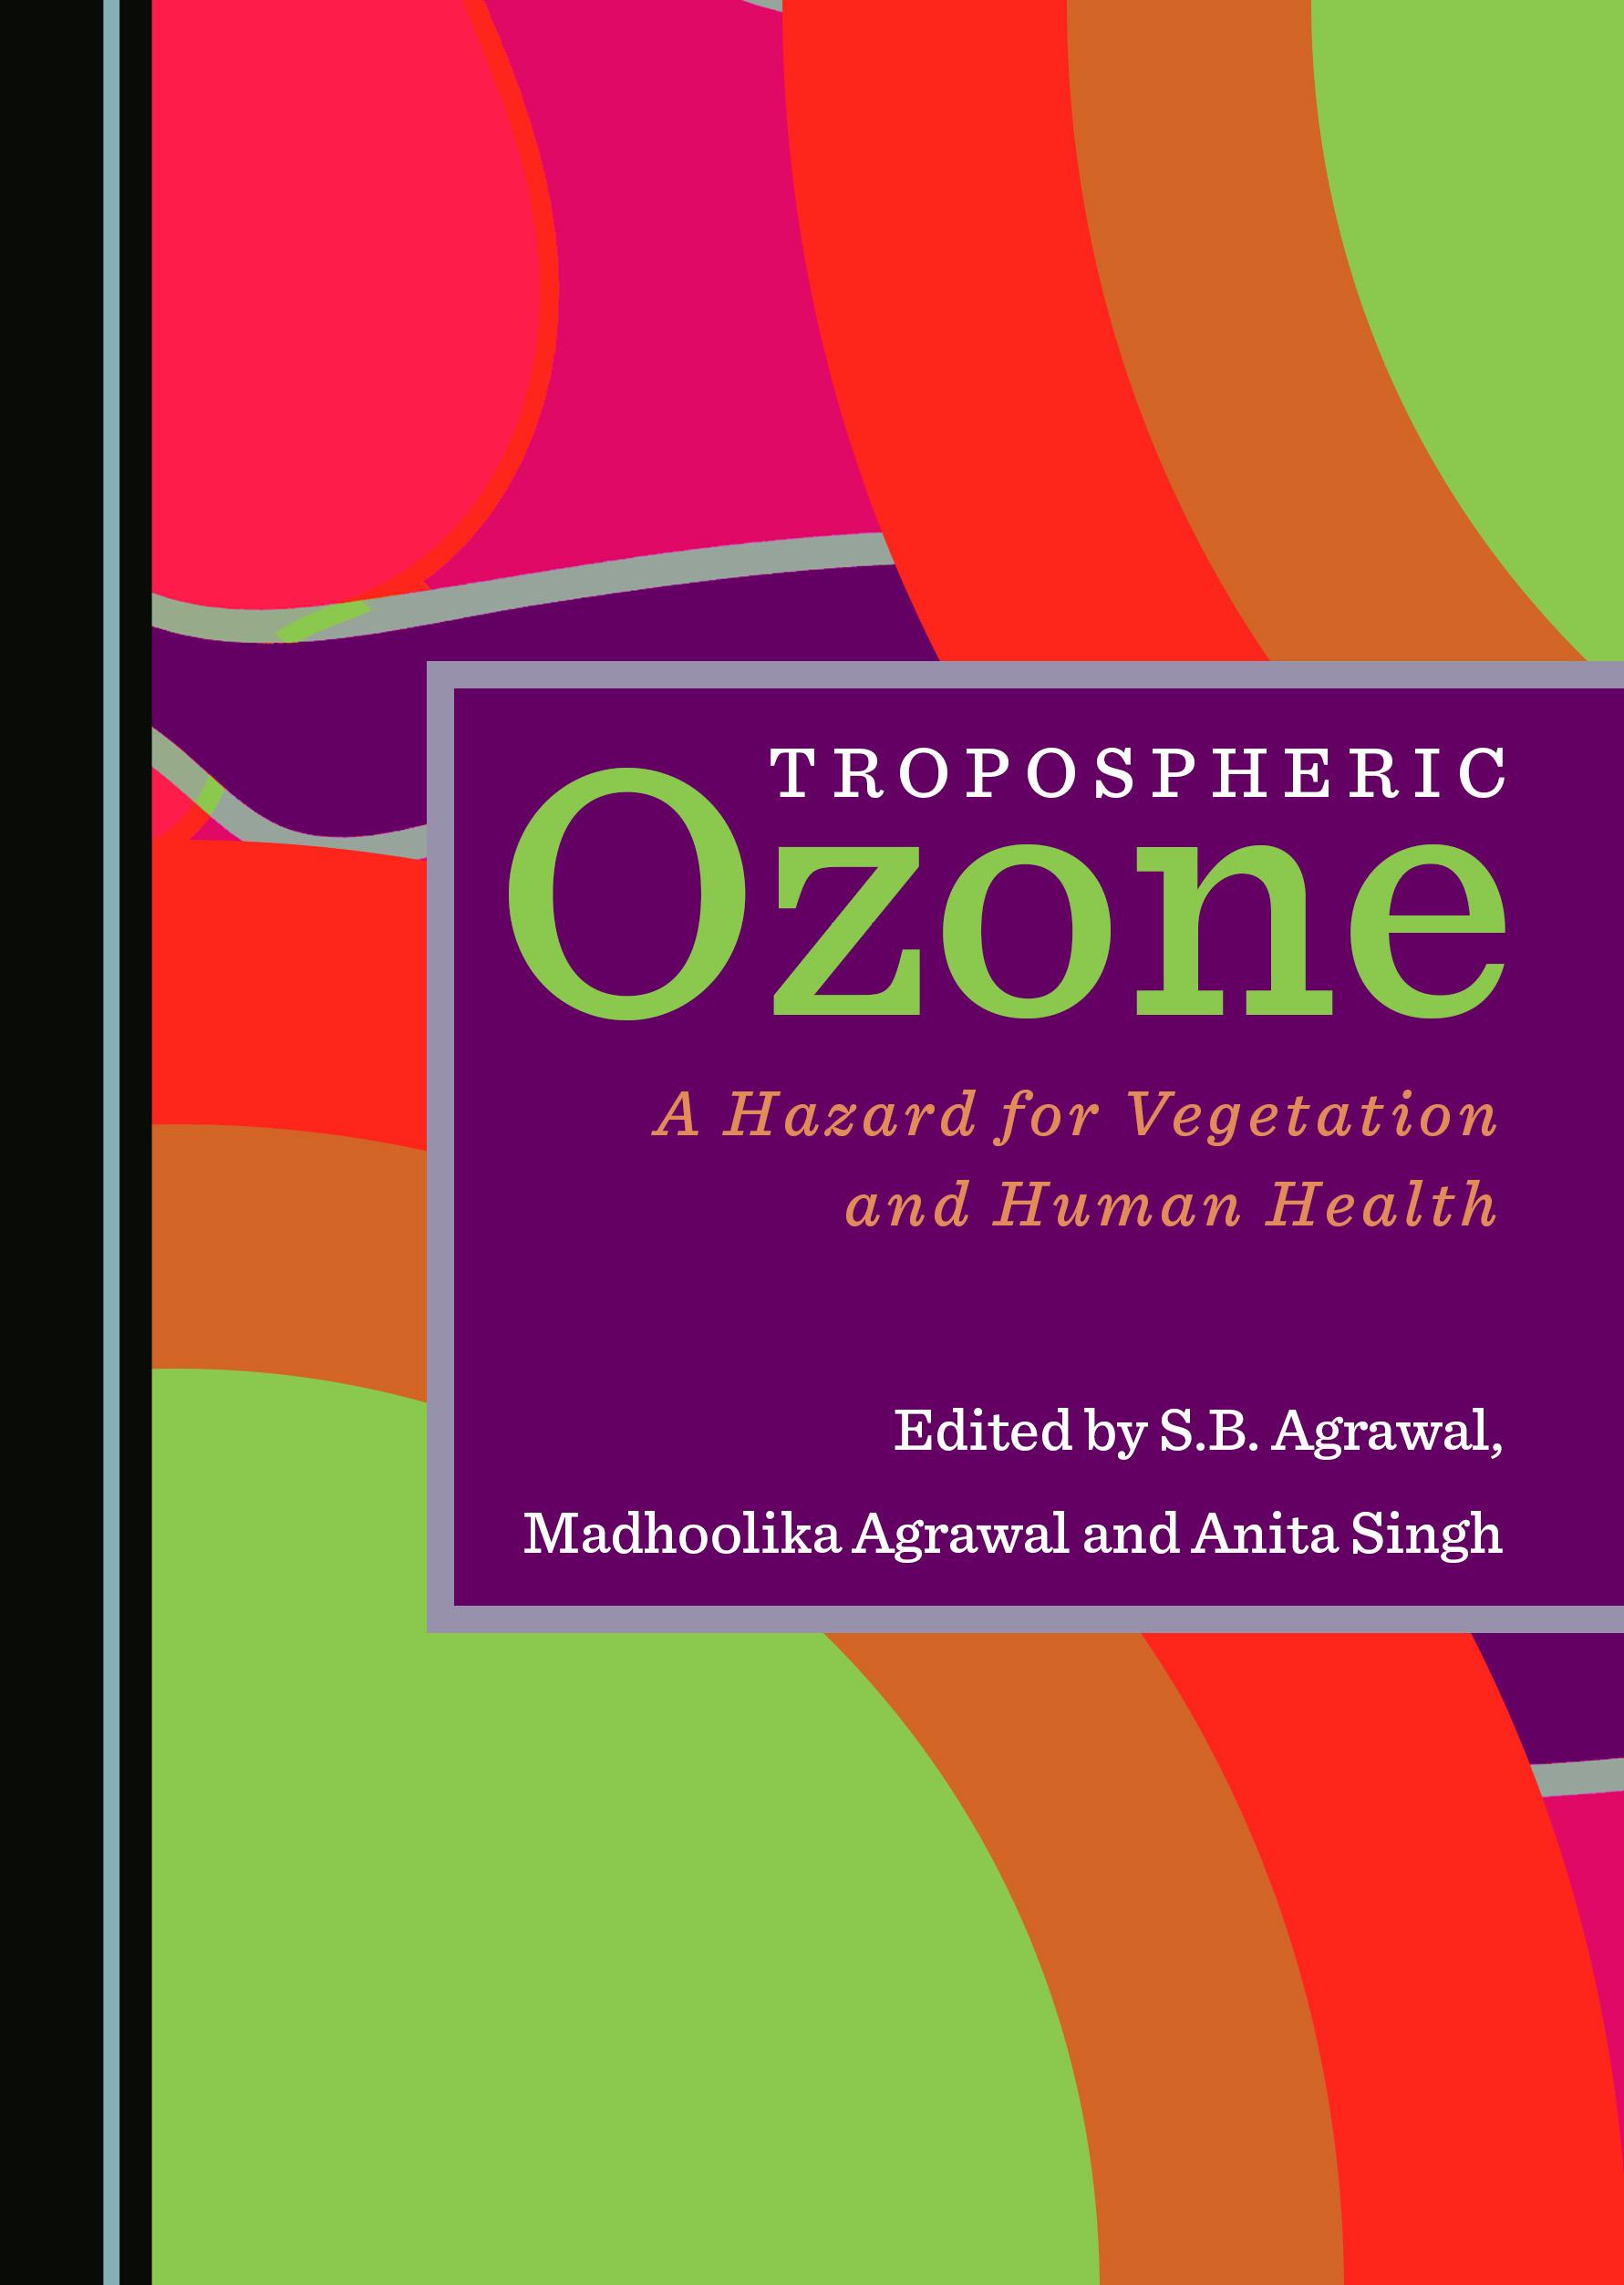 Tropospheric Ozone: A Hazard for Vegetation and Human Health